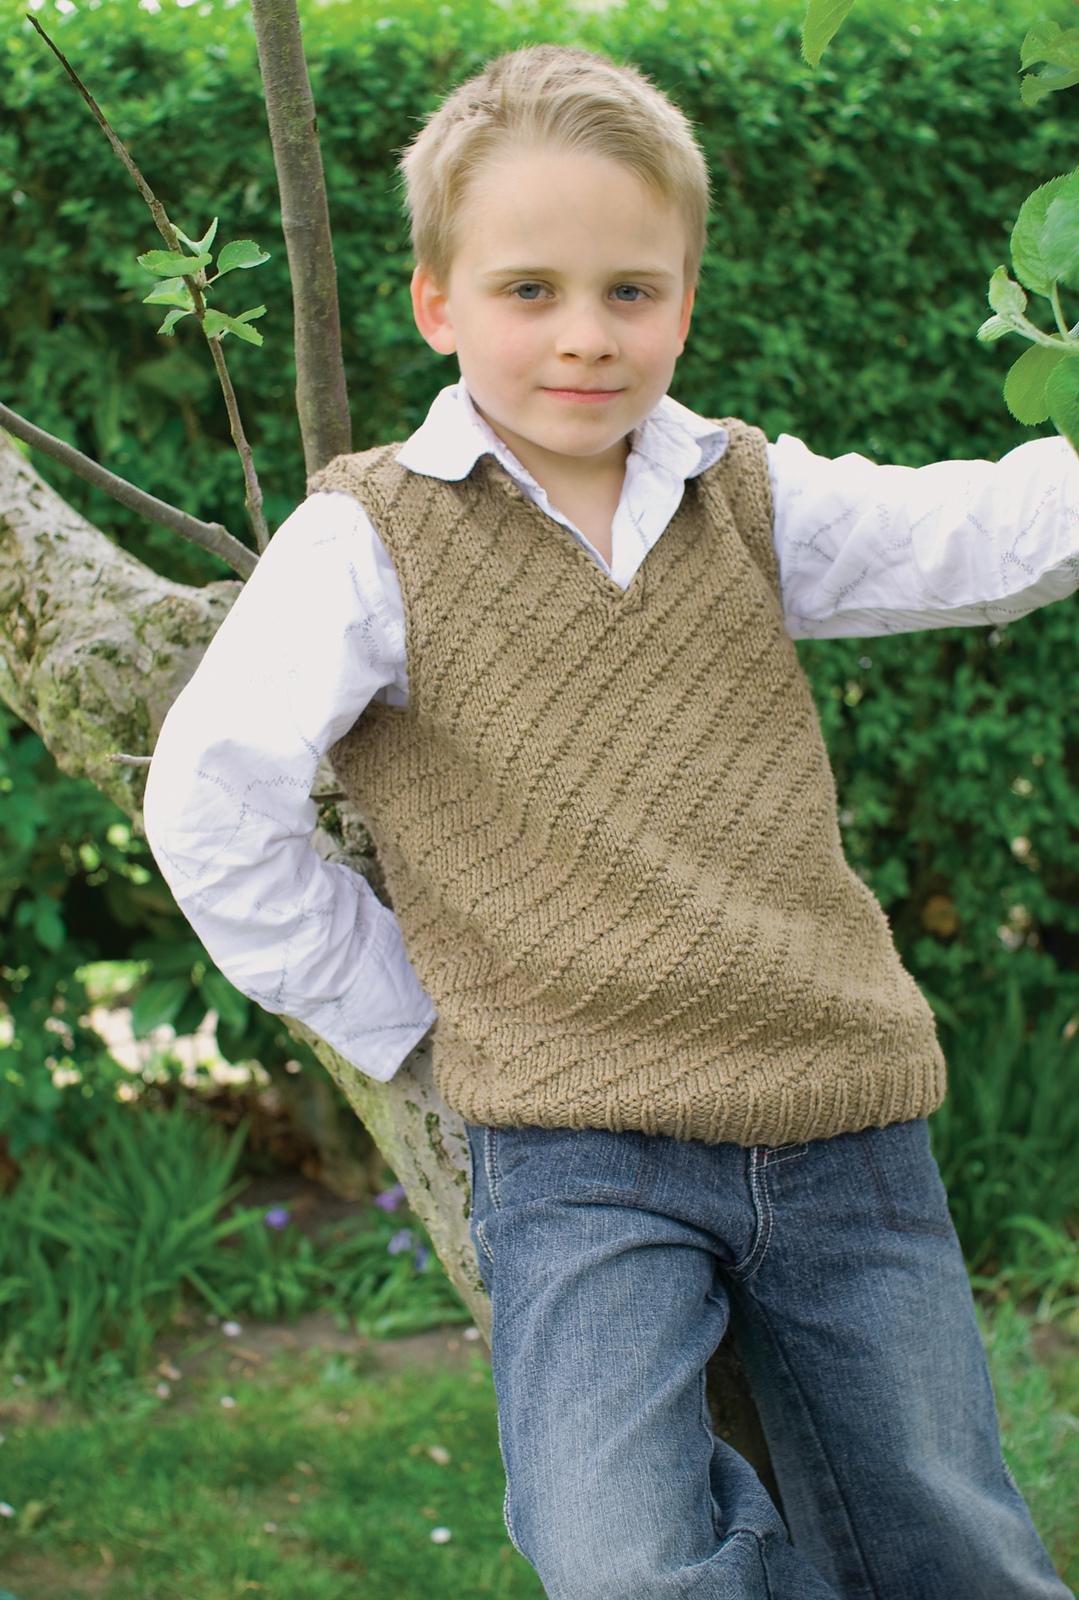 Knitting Pattern For Boys Vest : Knitterella Most of the time I knit?: BLOG TOUR: Boys Knits